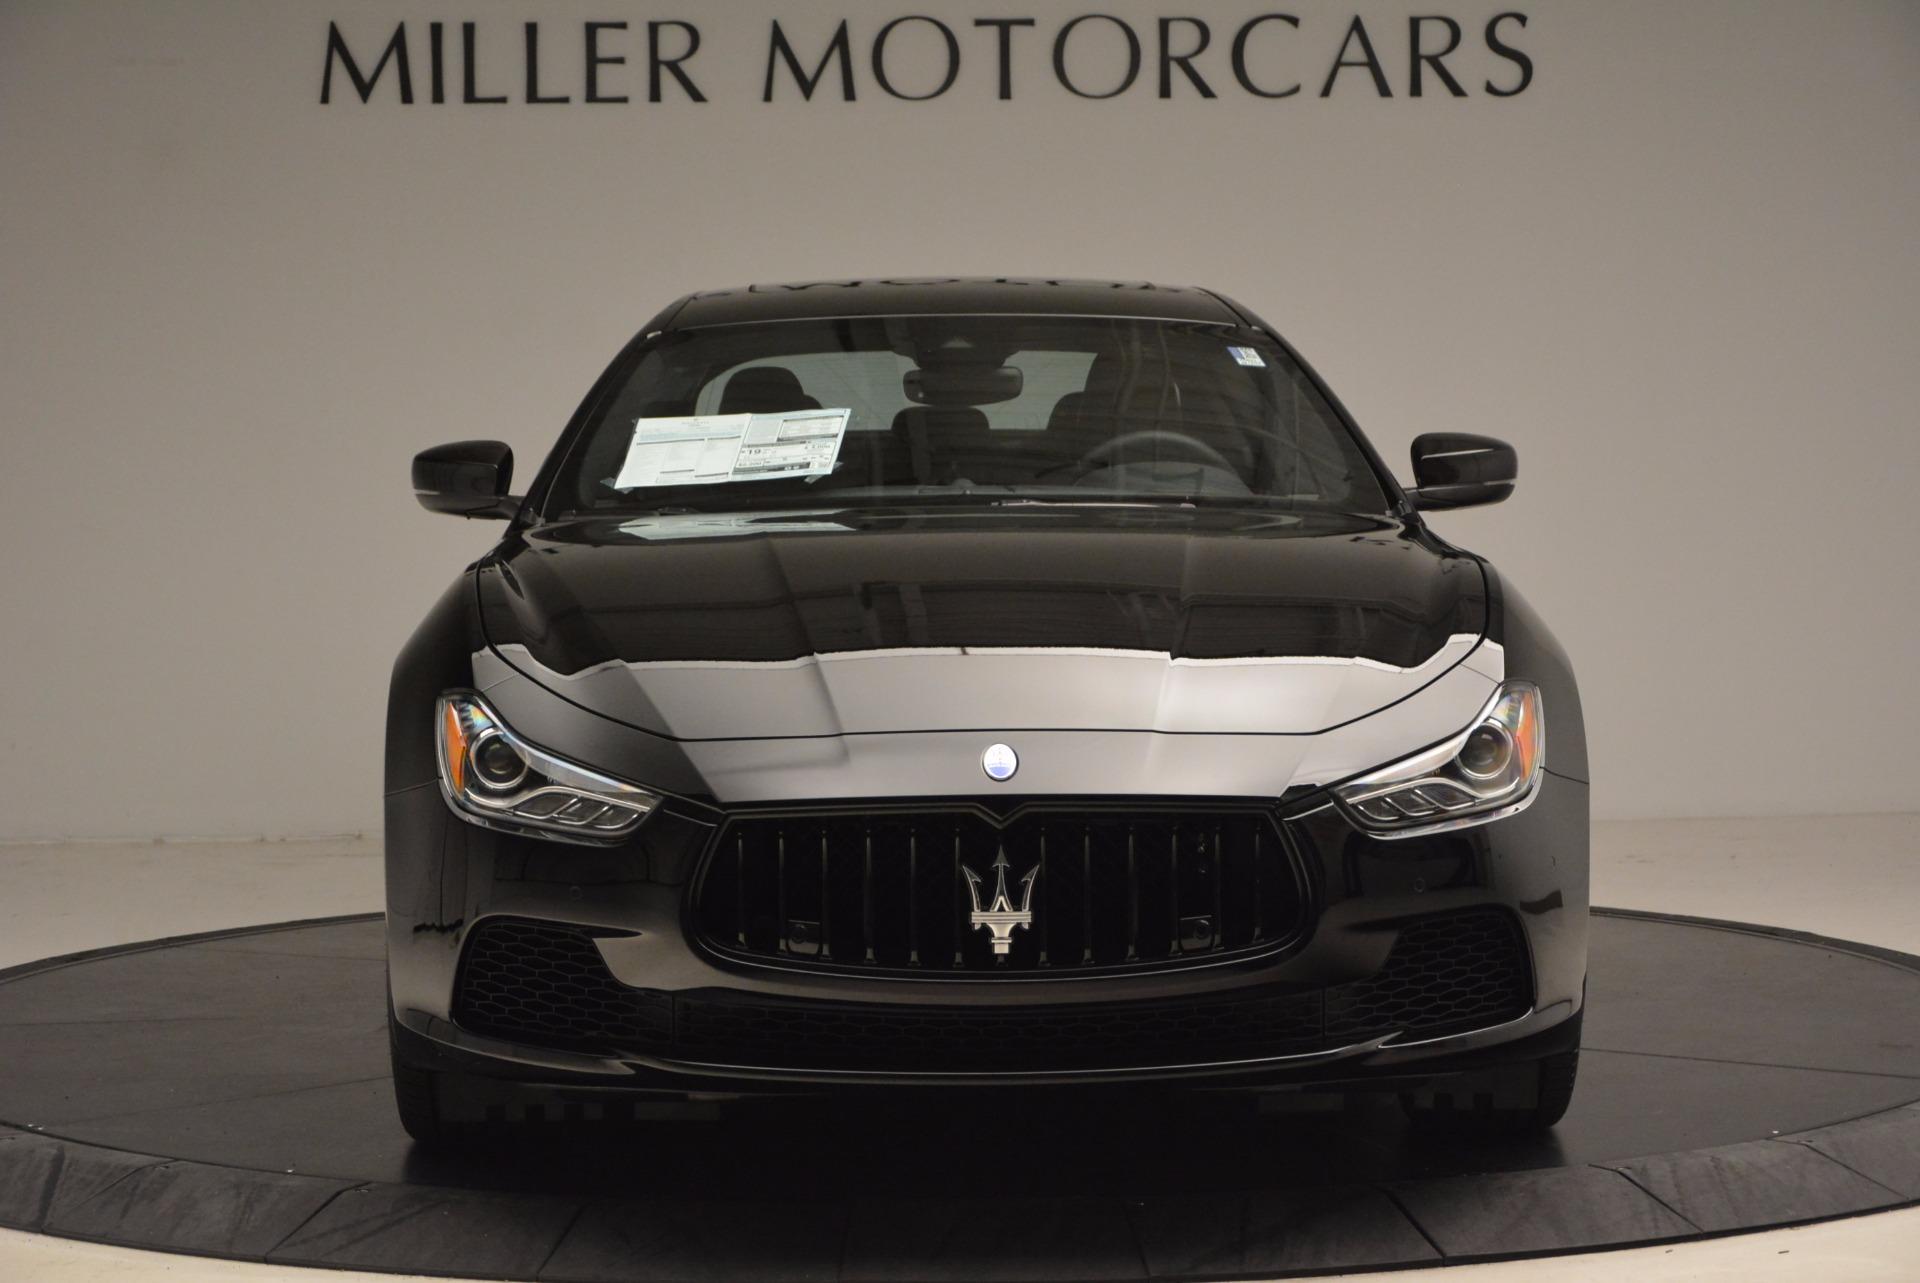 New-2017-Maserati-Ghibli-Nerissimo-Edition-S-Q4